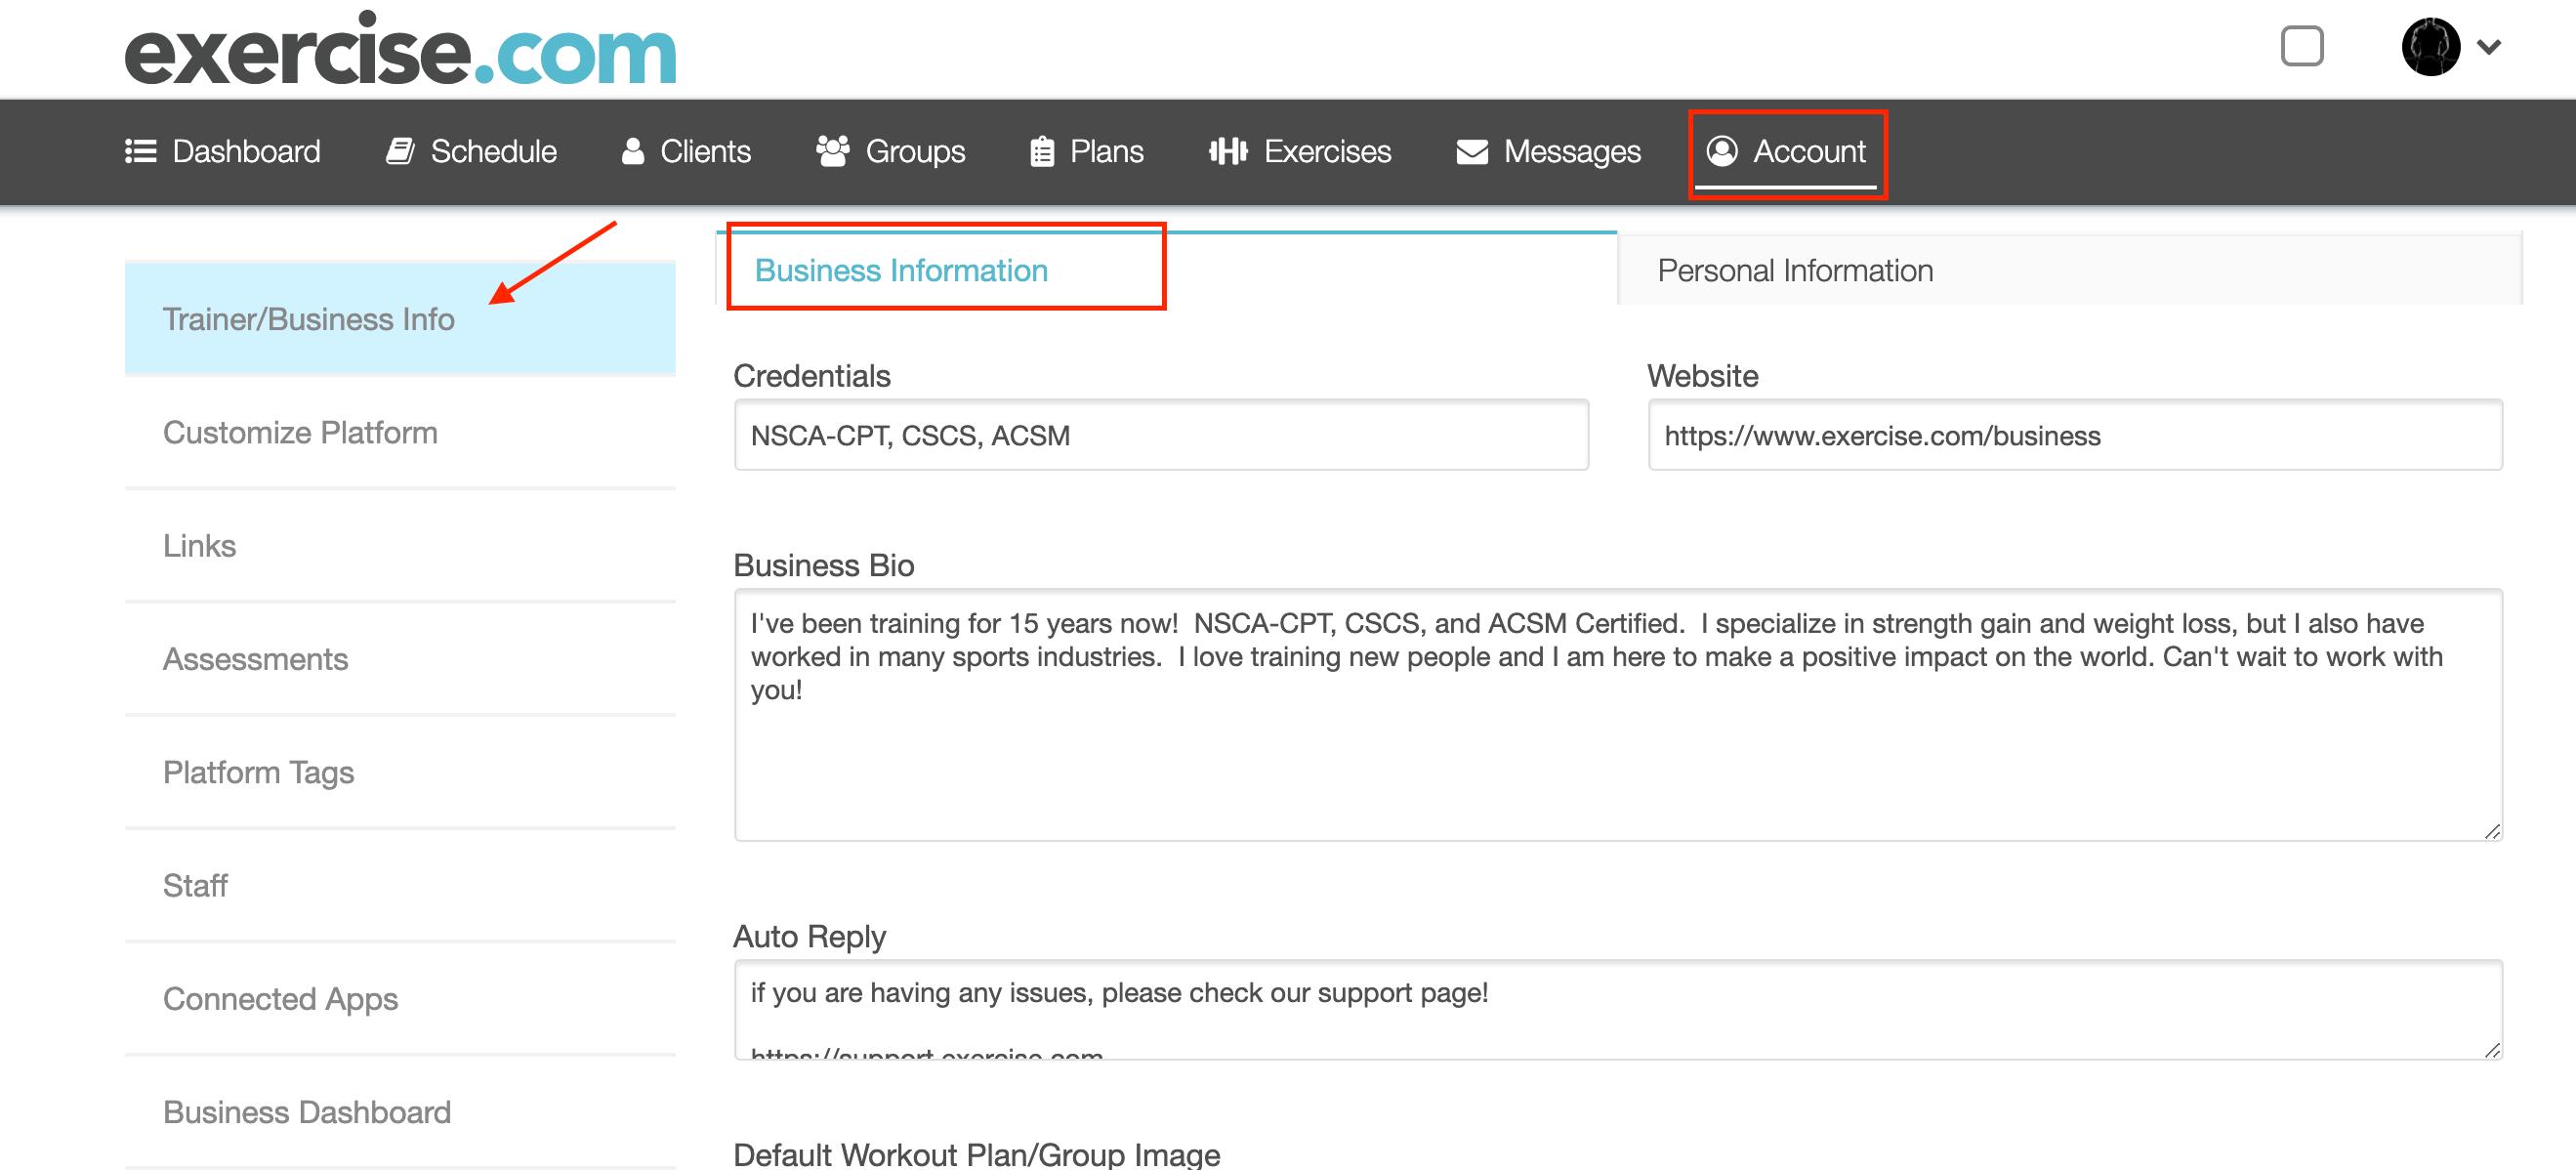 business accunt profile setup exercise.com